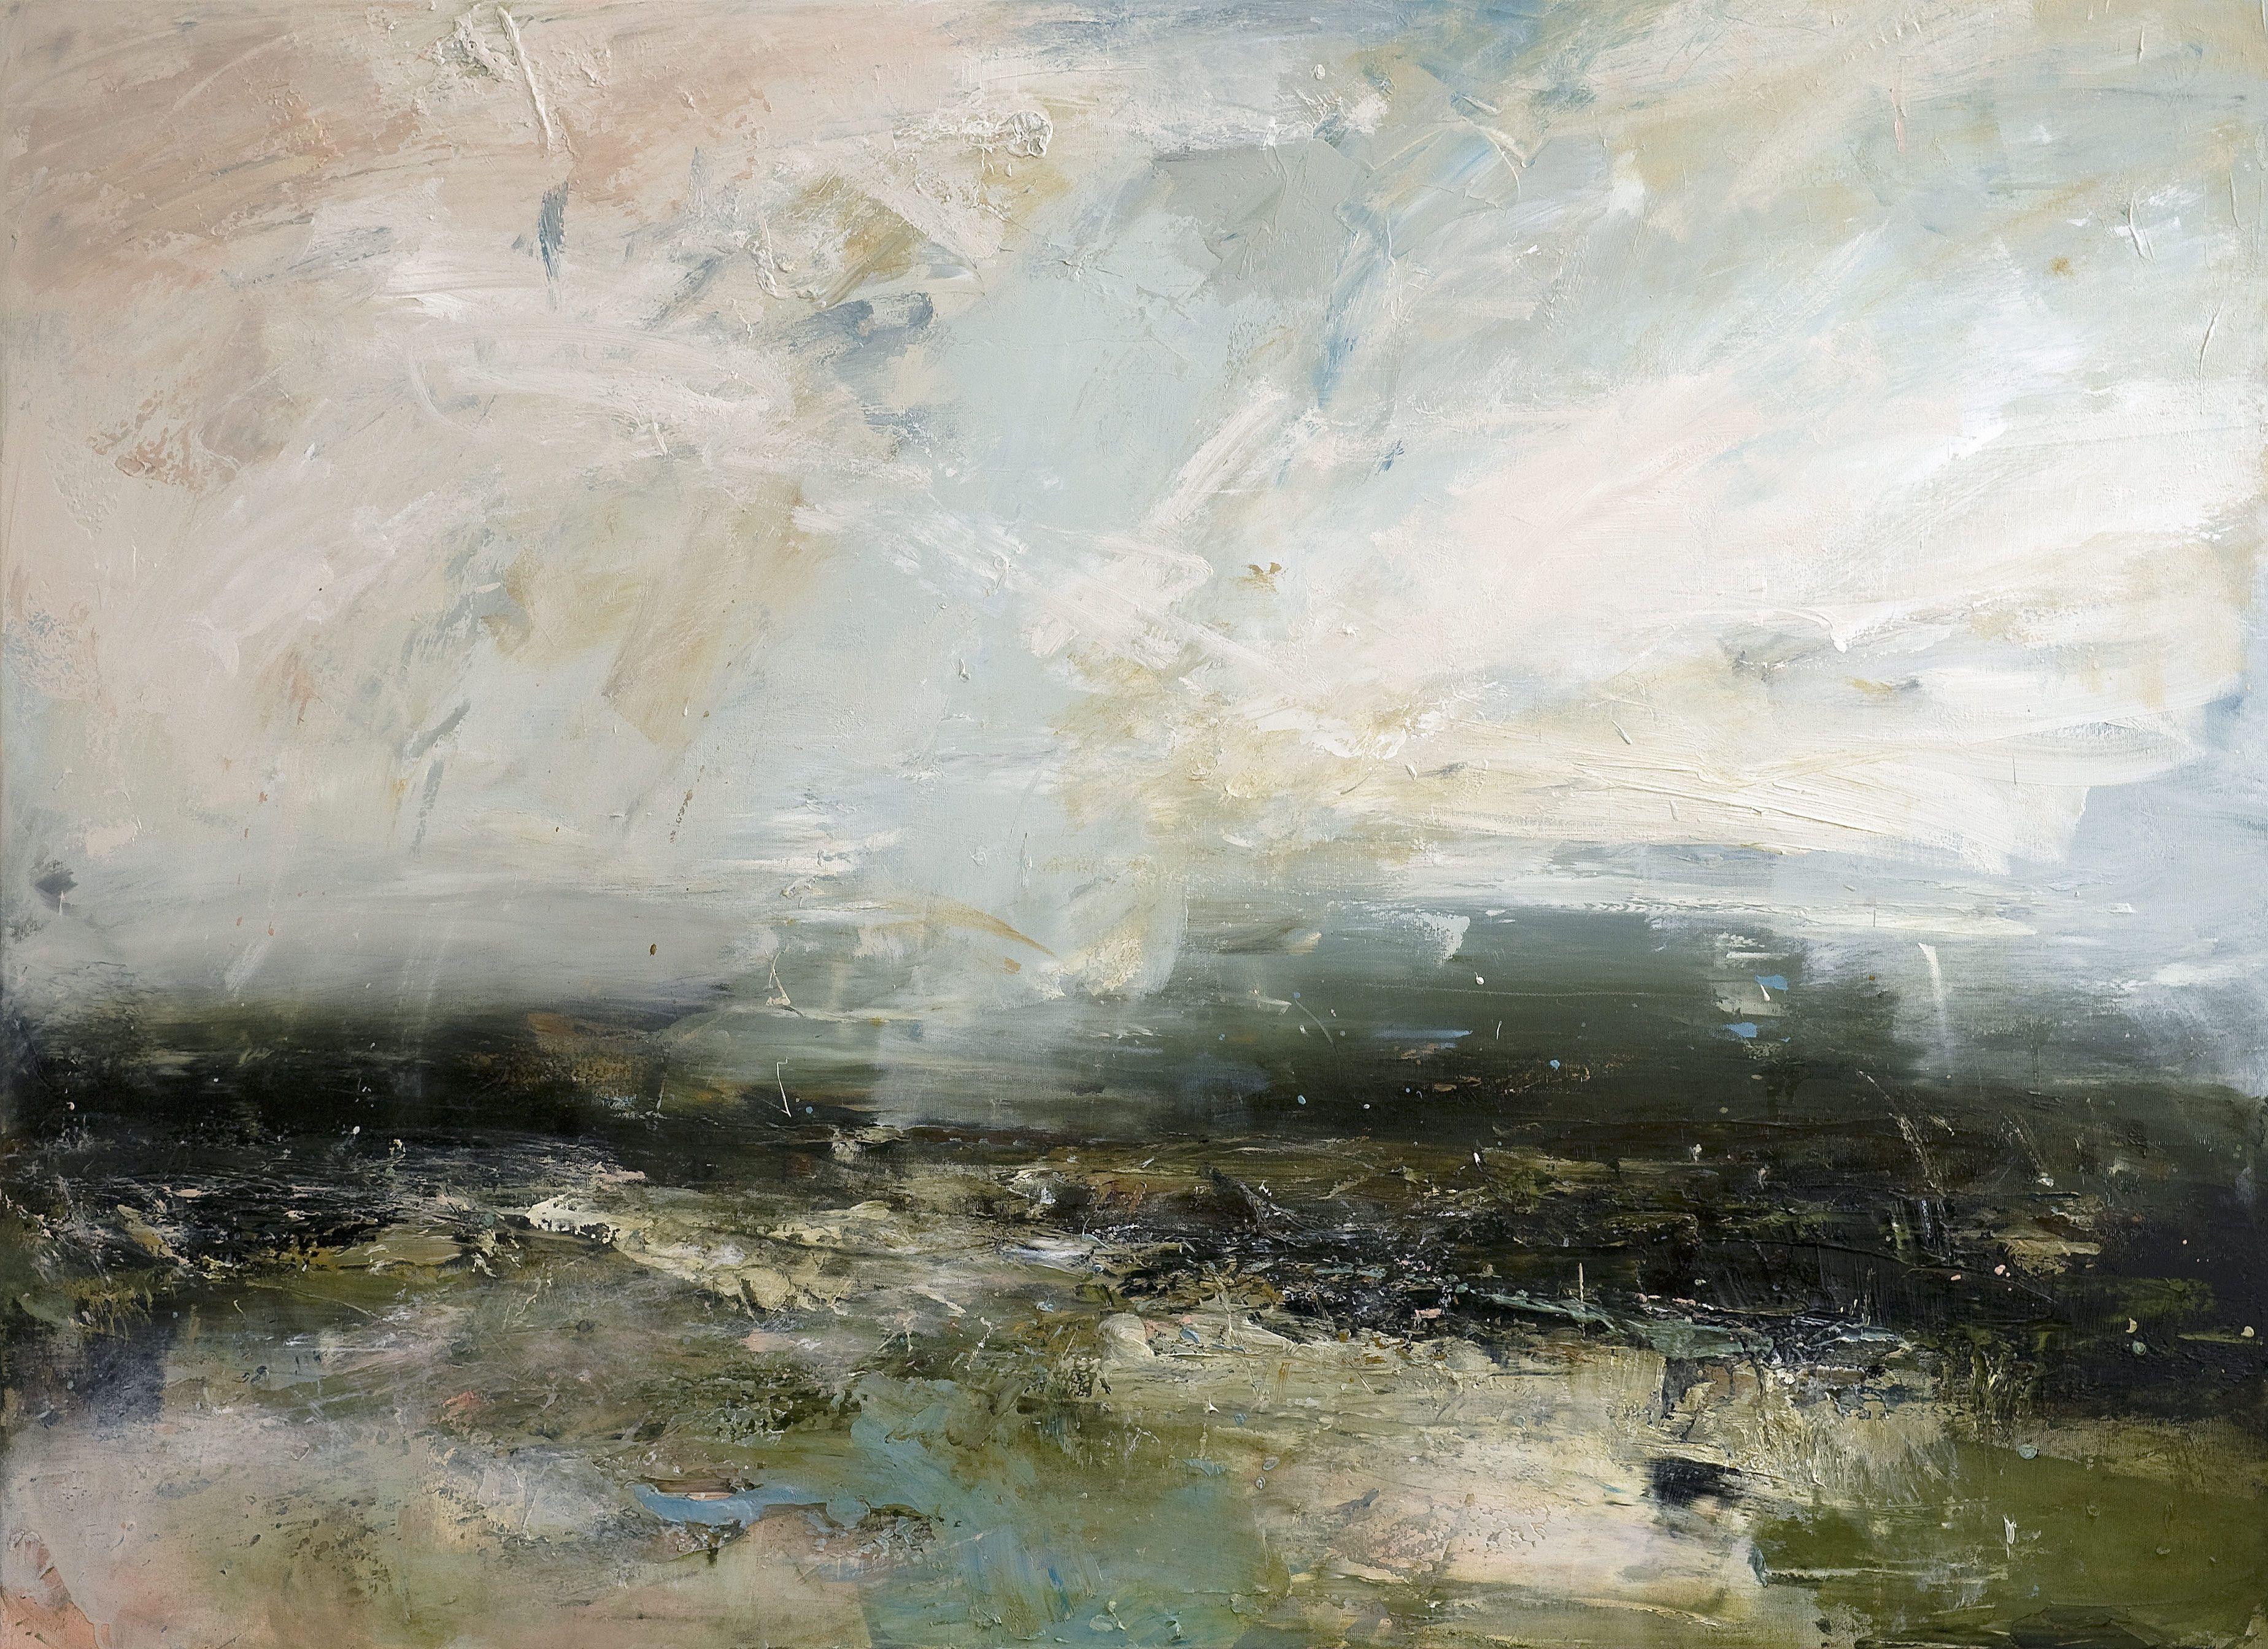 Celestial 2015 oil on canvas 95cm x 130cm by Dion Salvador Lloyd http://www.dionsalvador.co.uk